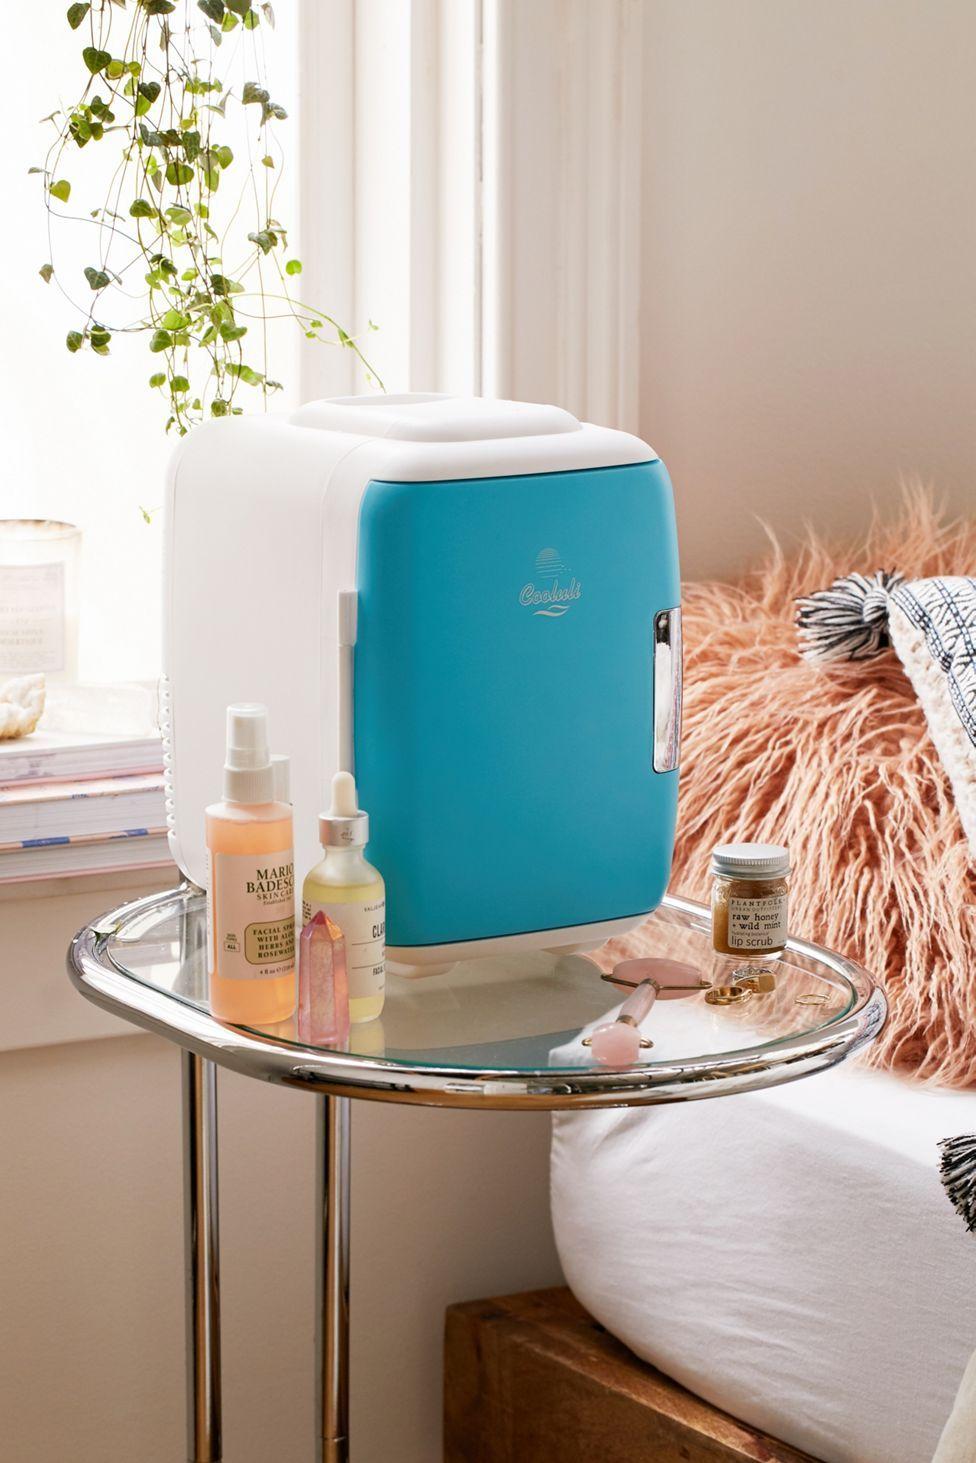 Cooluli Mini Beauty Refrigerator in 2020 Mini fridges